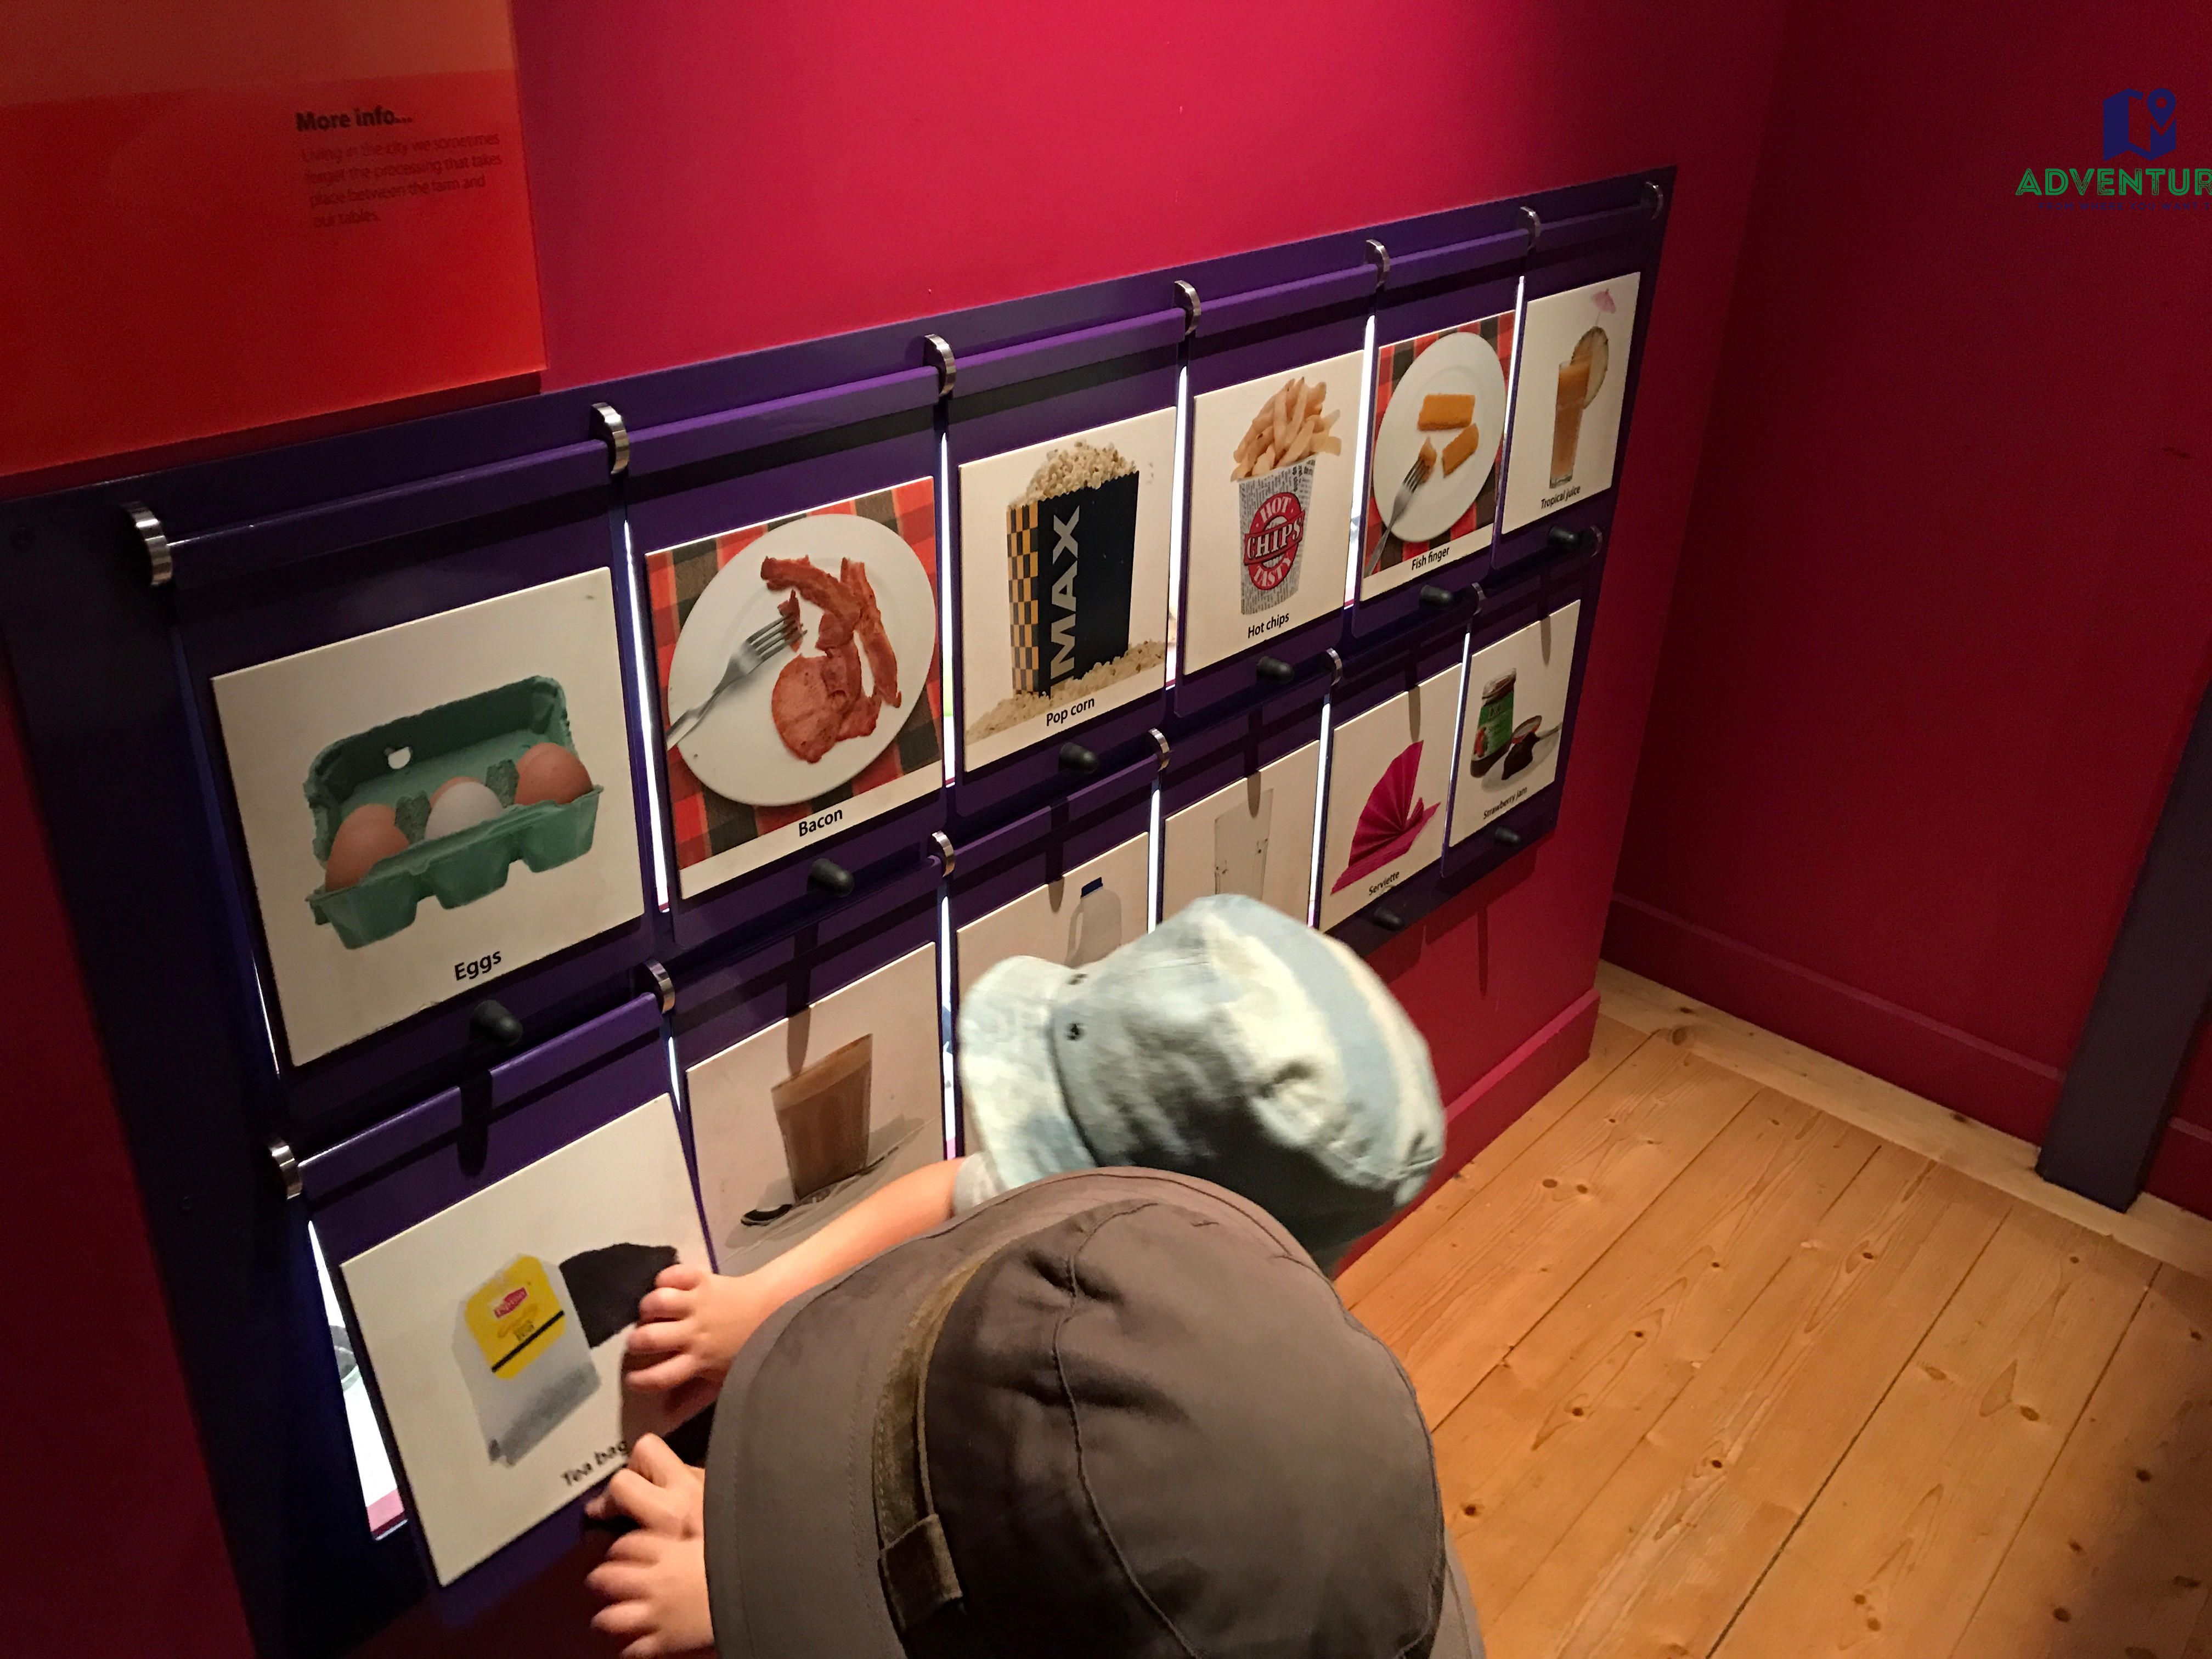 Science Works - Main exhibit